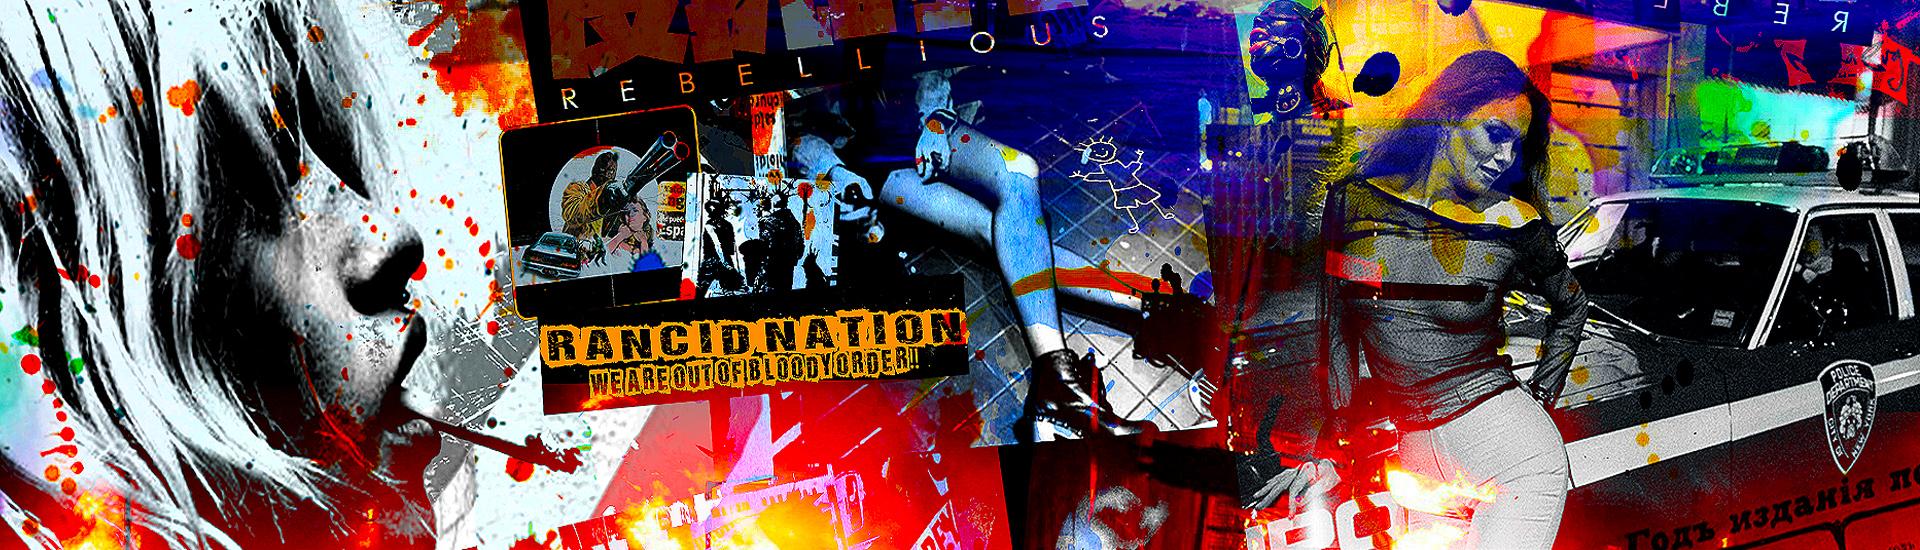 Rancid Nation Grunge Models